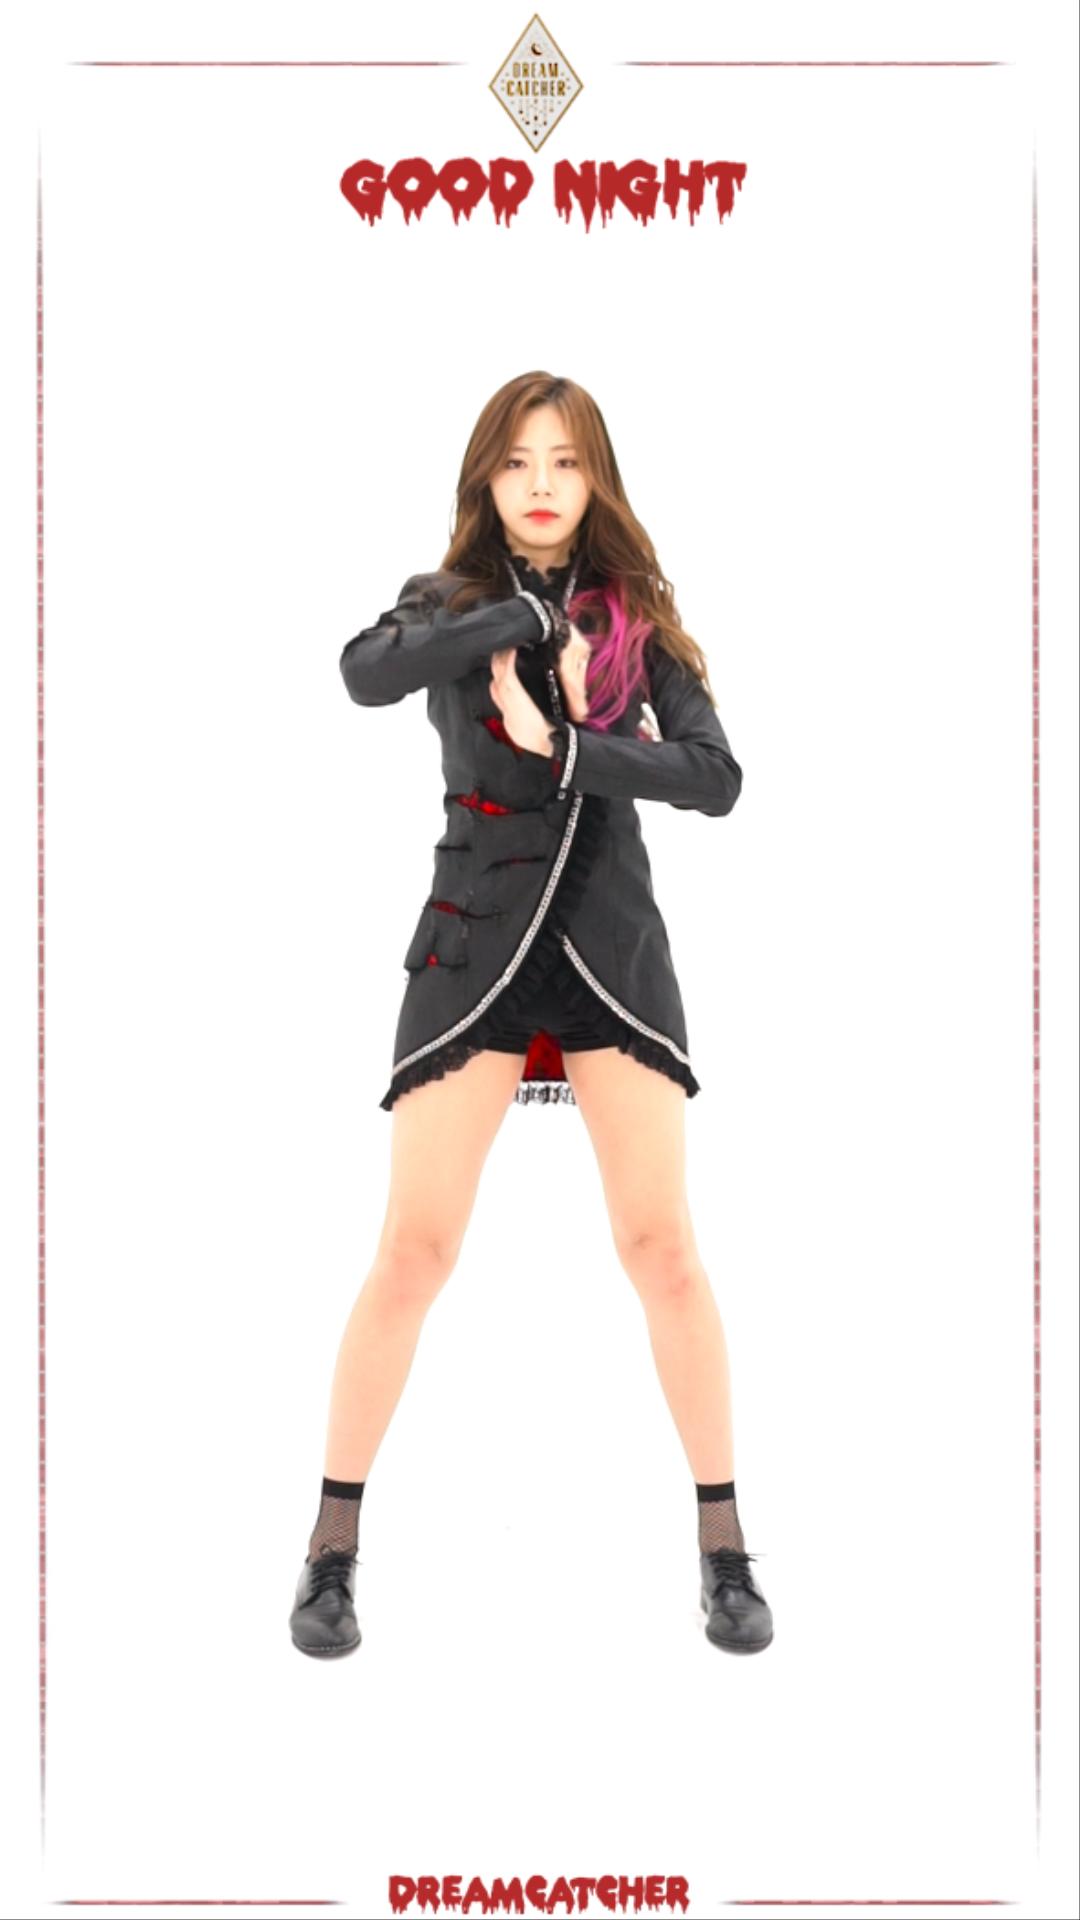 [Special Clip] Dreamcatcher(드림캐쳐) 'Good Night' 안무 교차편집 VER.